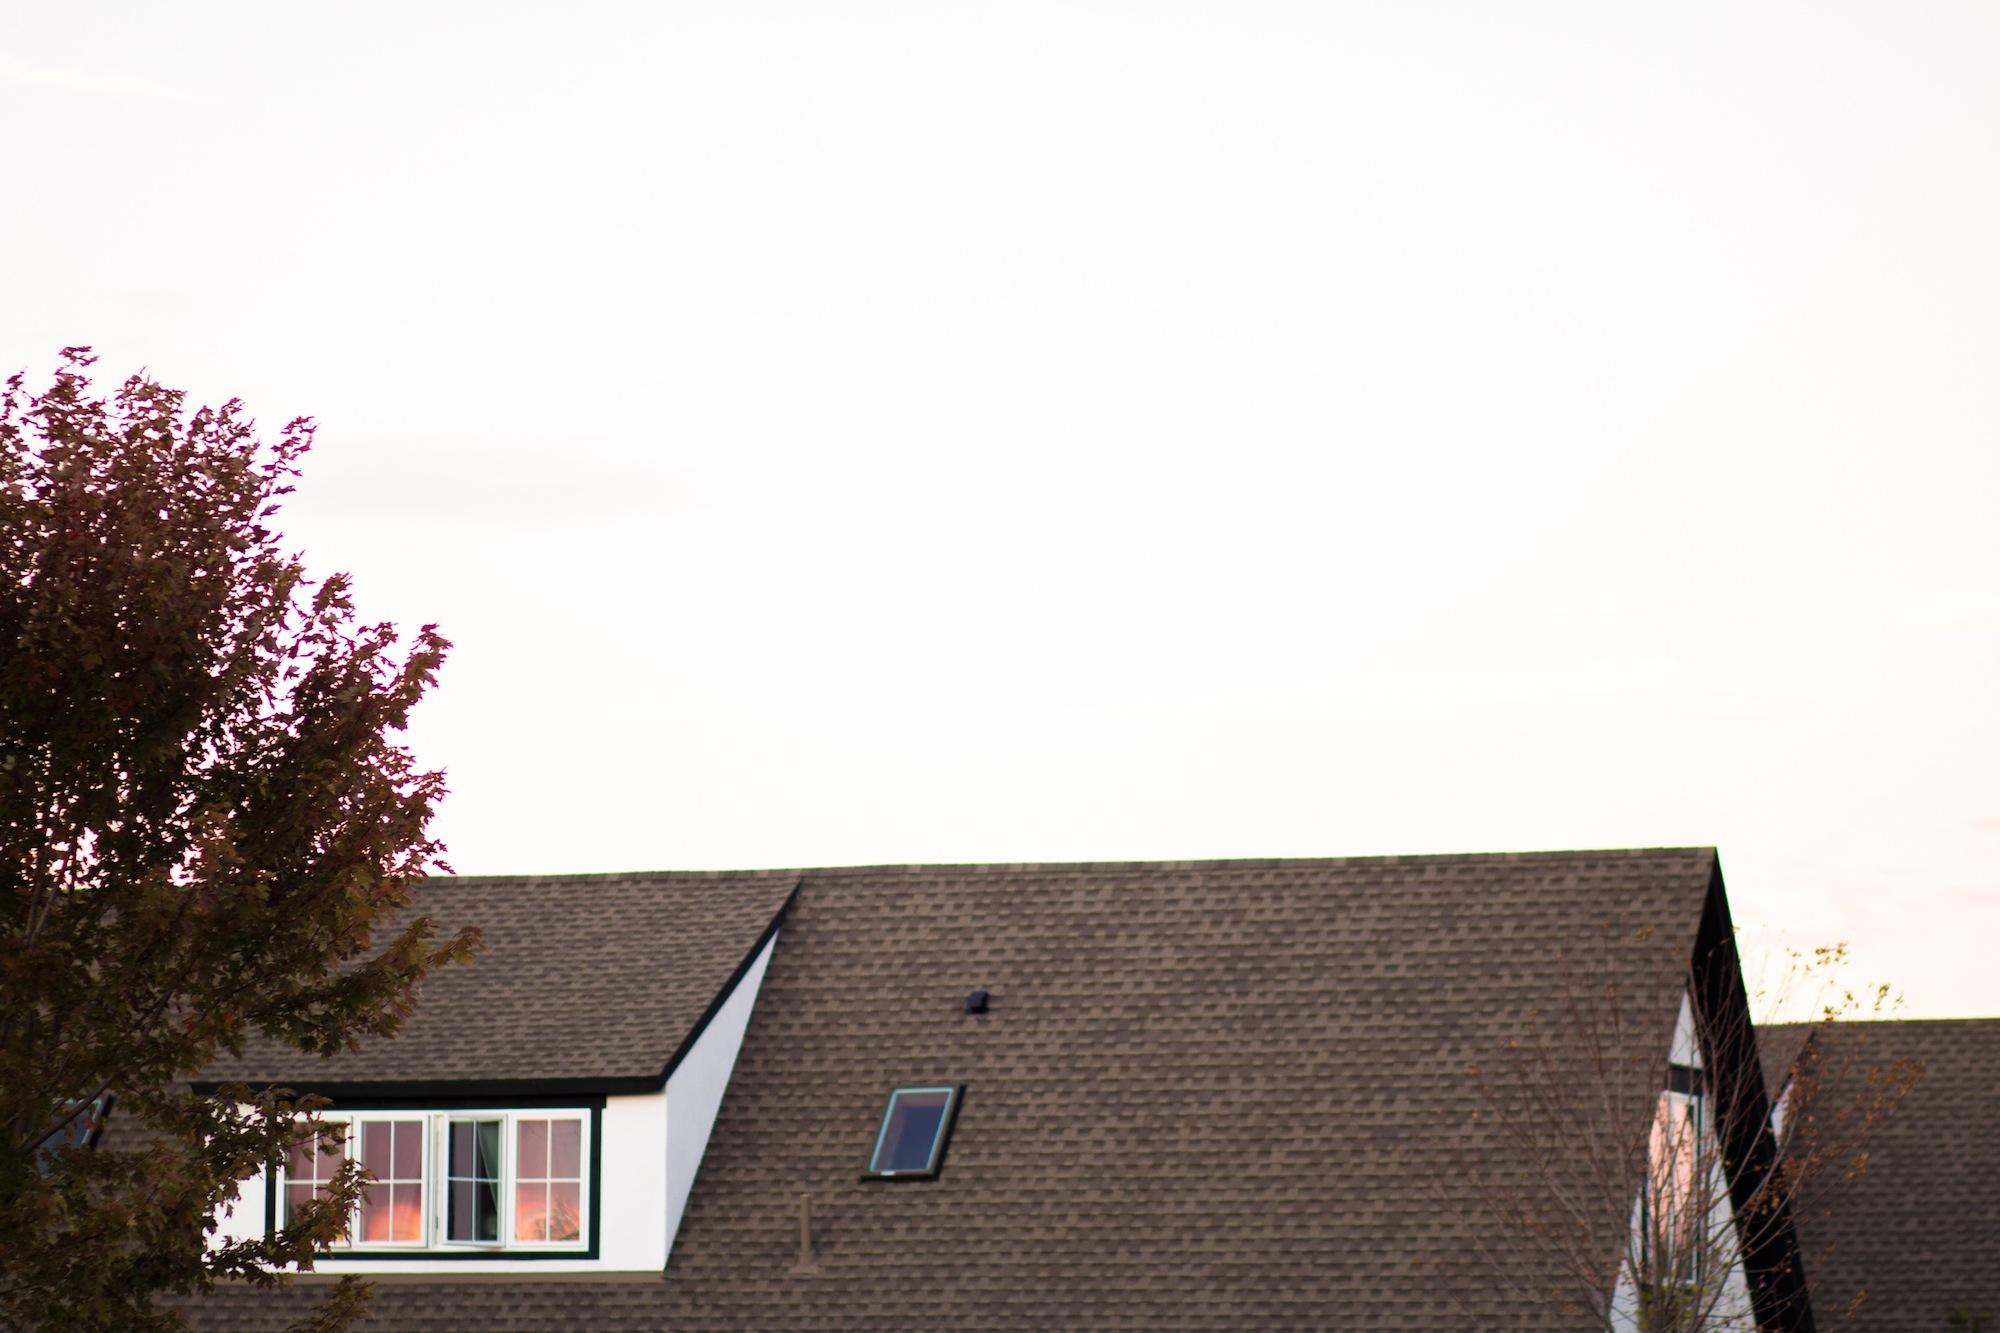 boiceville-cottages-esco-digital-brand-strategy-tiny-houses.JPG